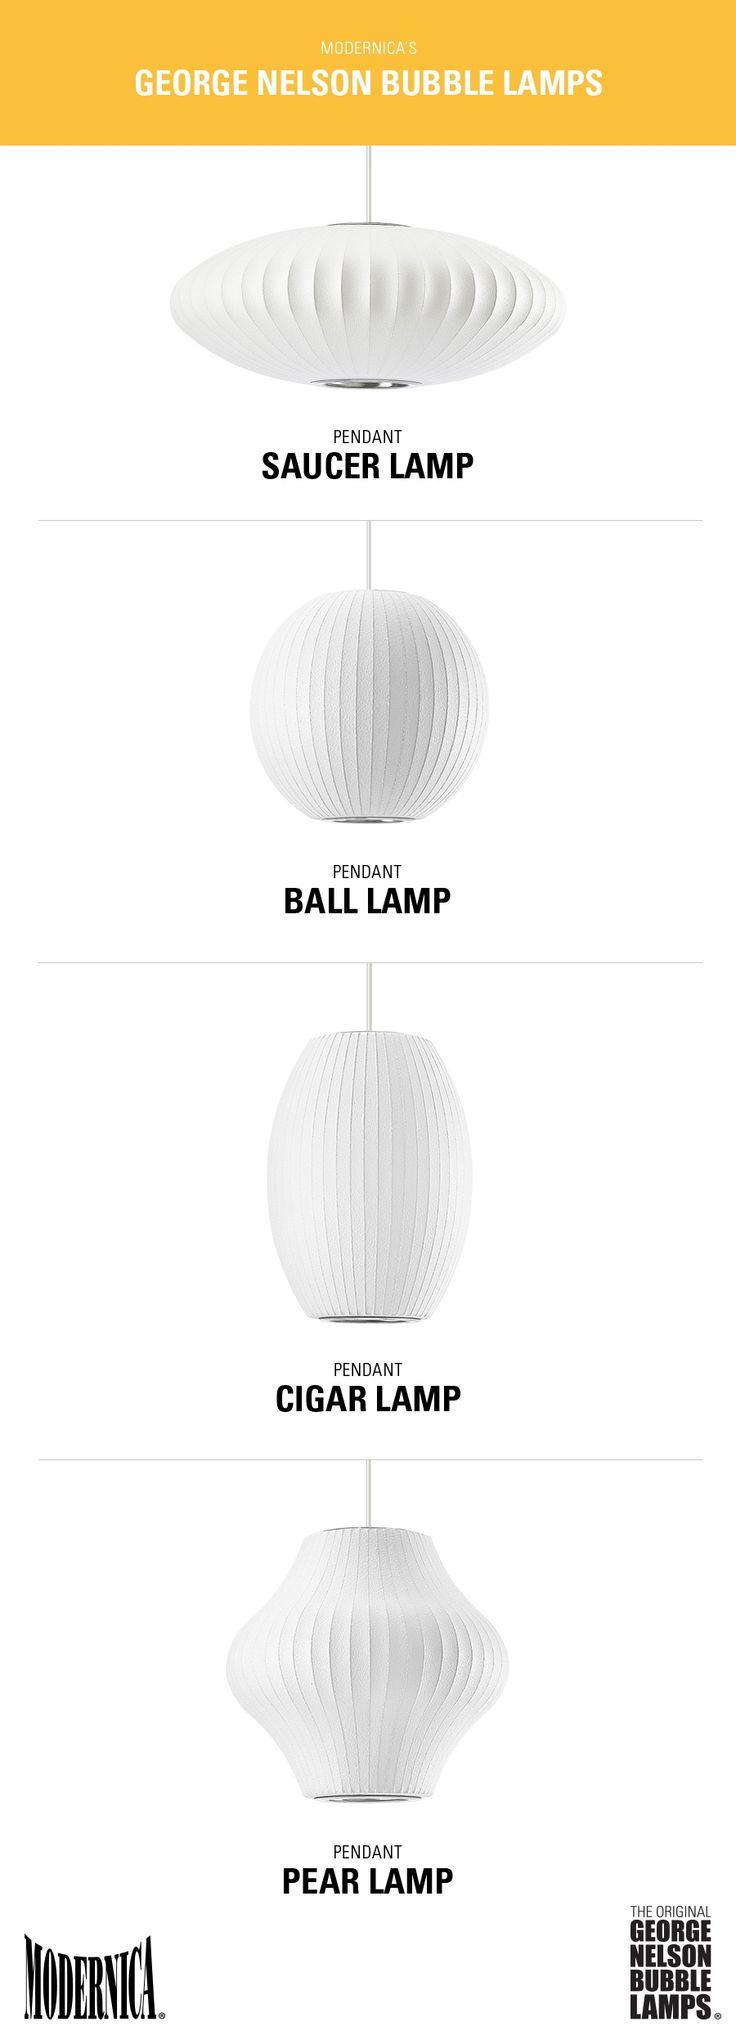 Modernica George Nelson Bubble Lamp Pendant lamps | mid-century modern iconic lighting